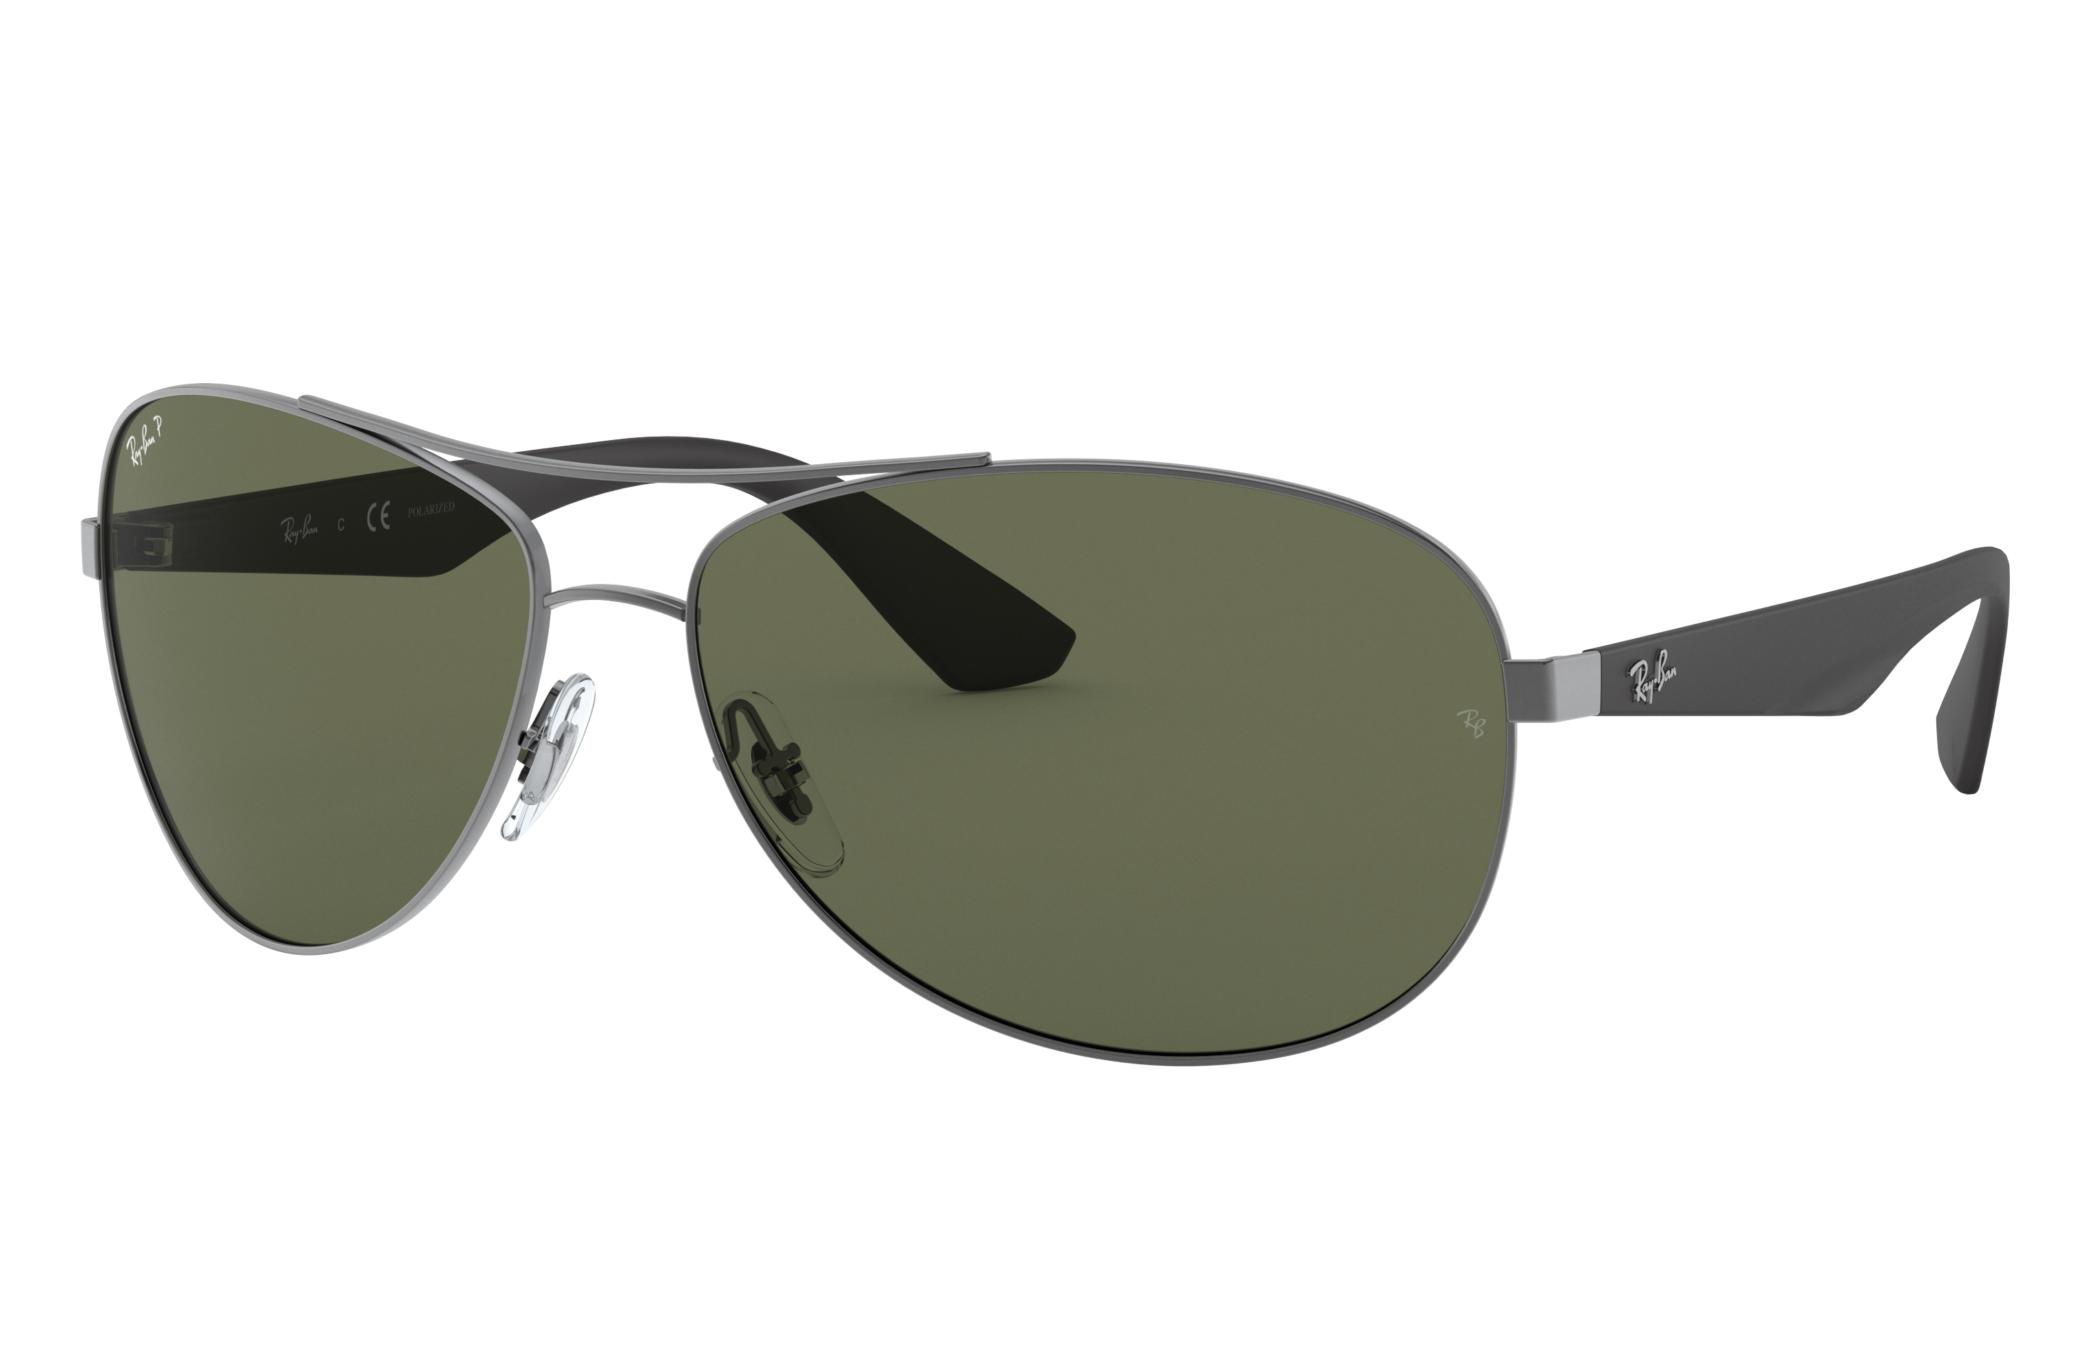 Ray-Ban Rb3526 Black, Polarized Green Lenses - RB3526